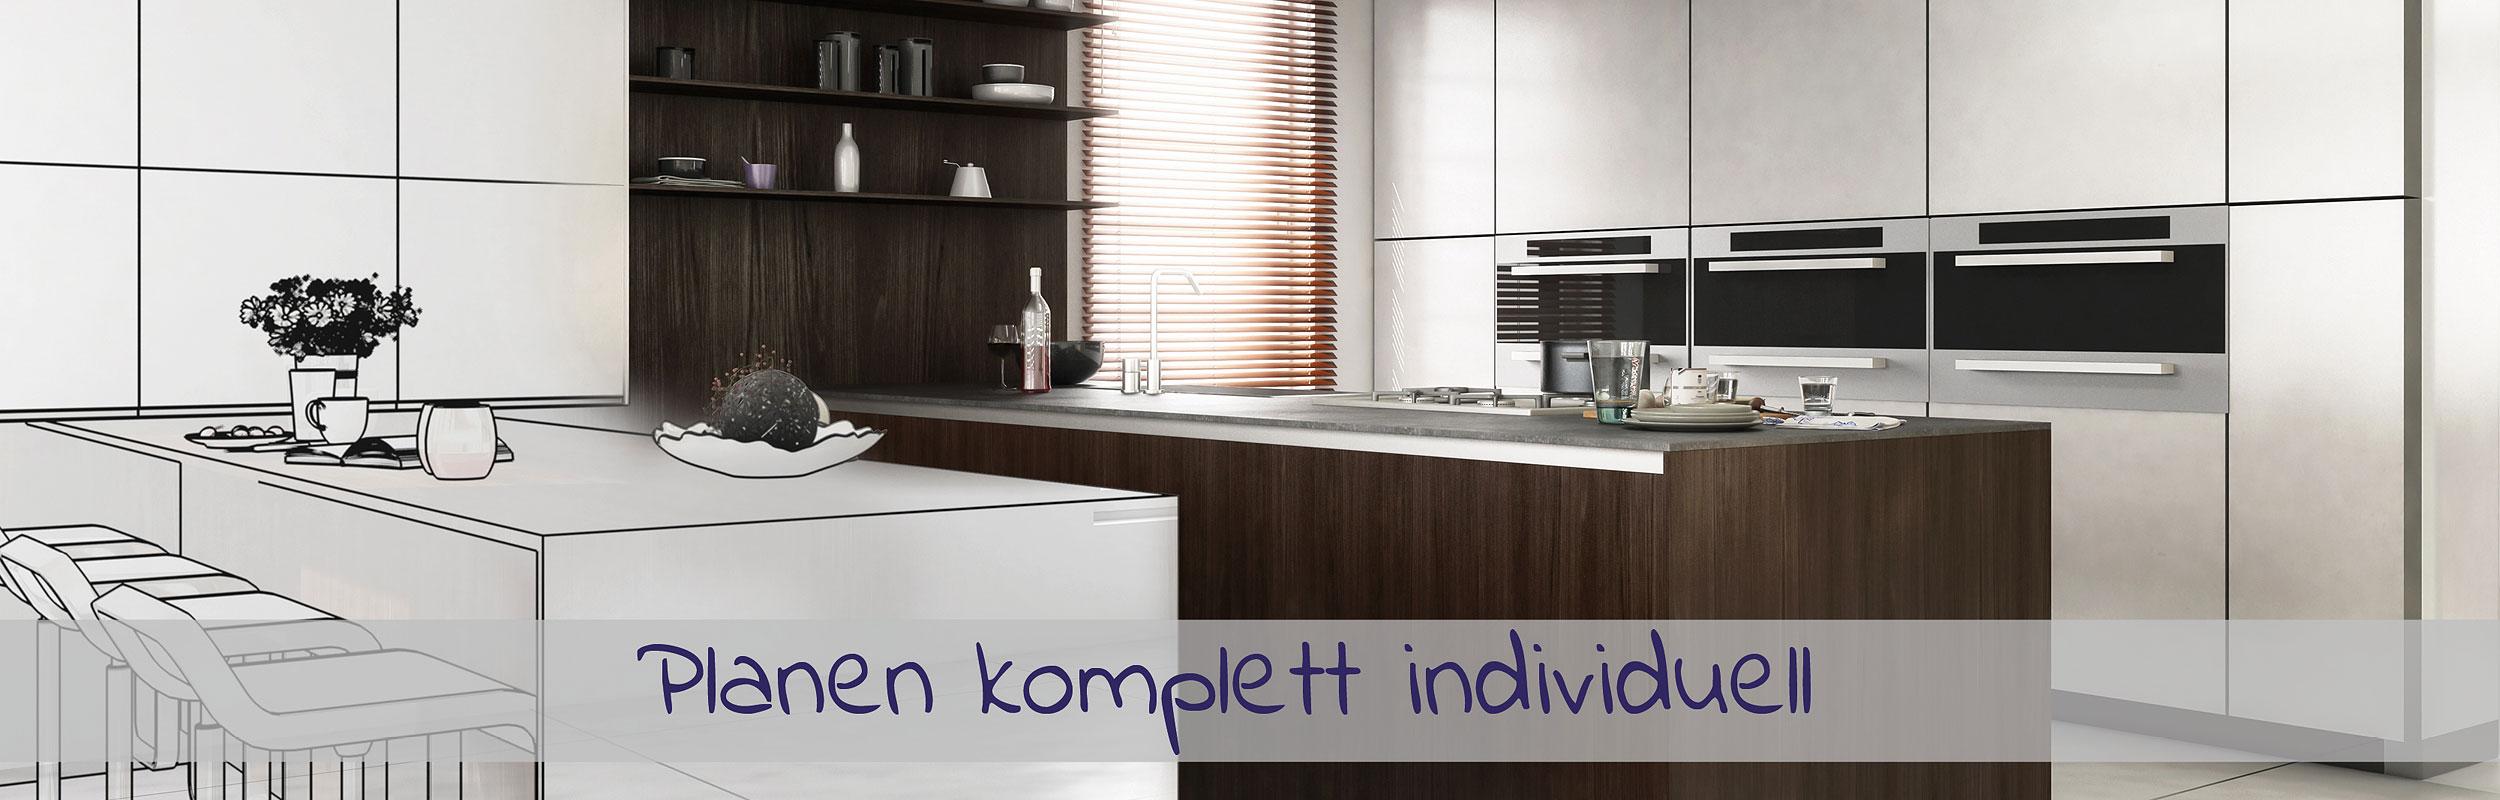 Planung komplett individuell - im Küchenland Auer